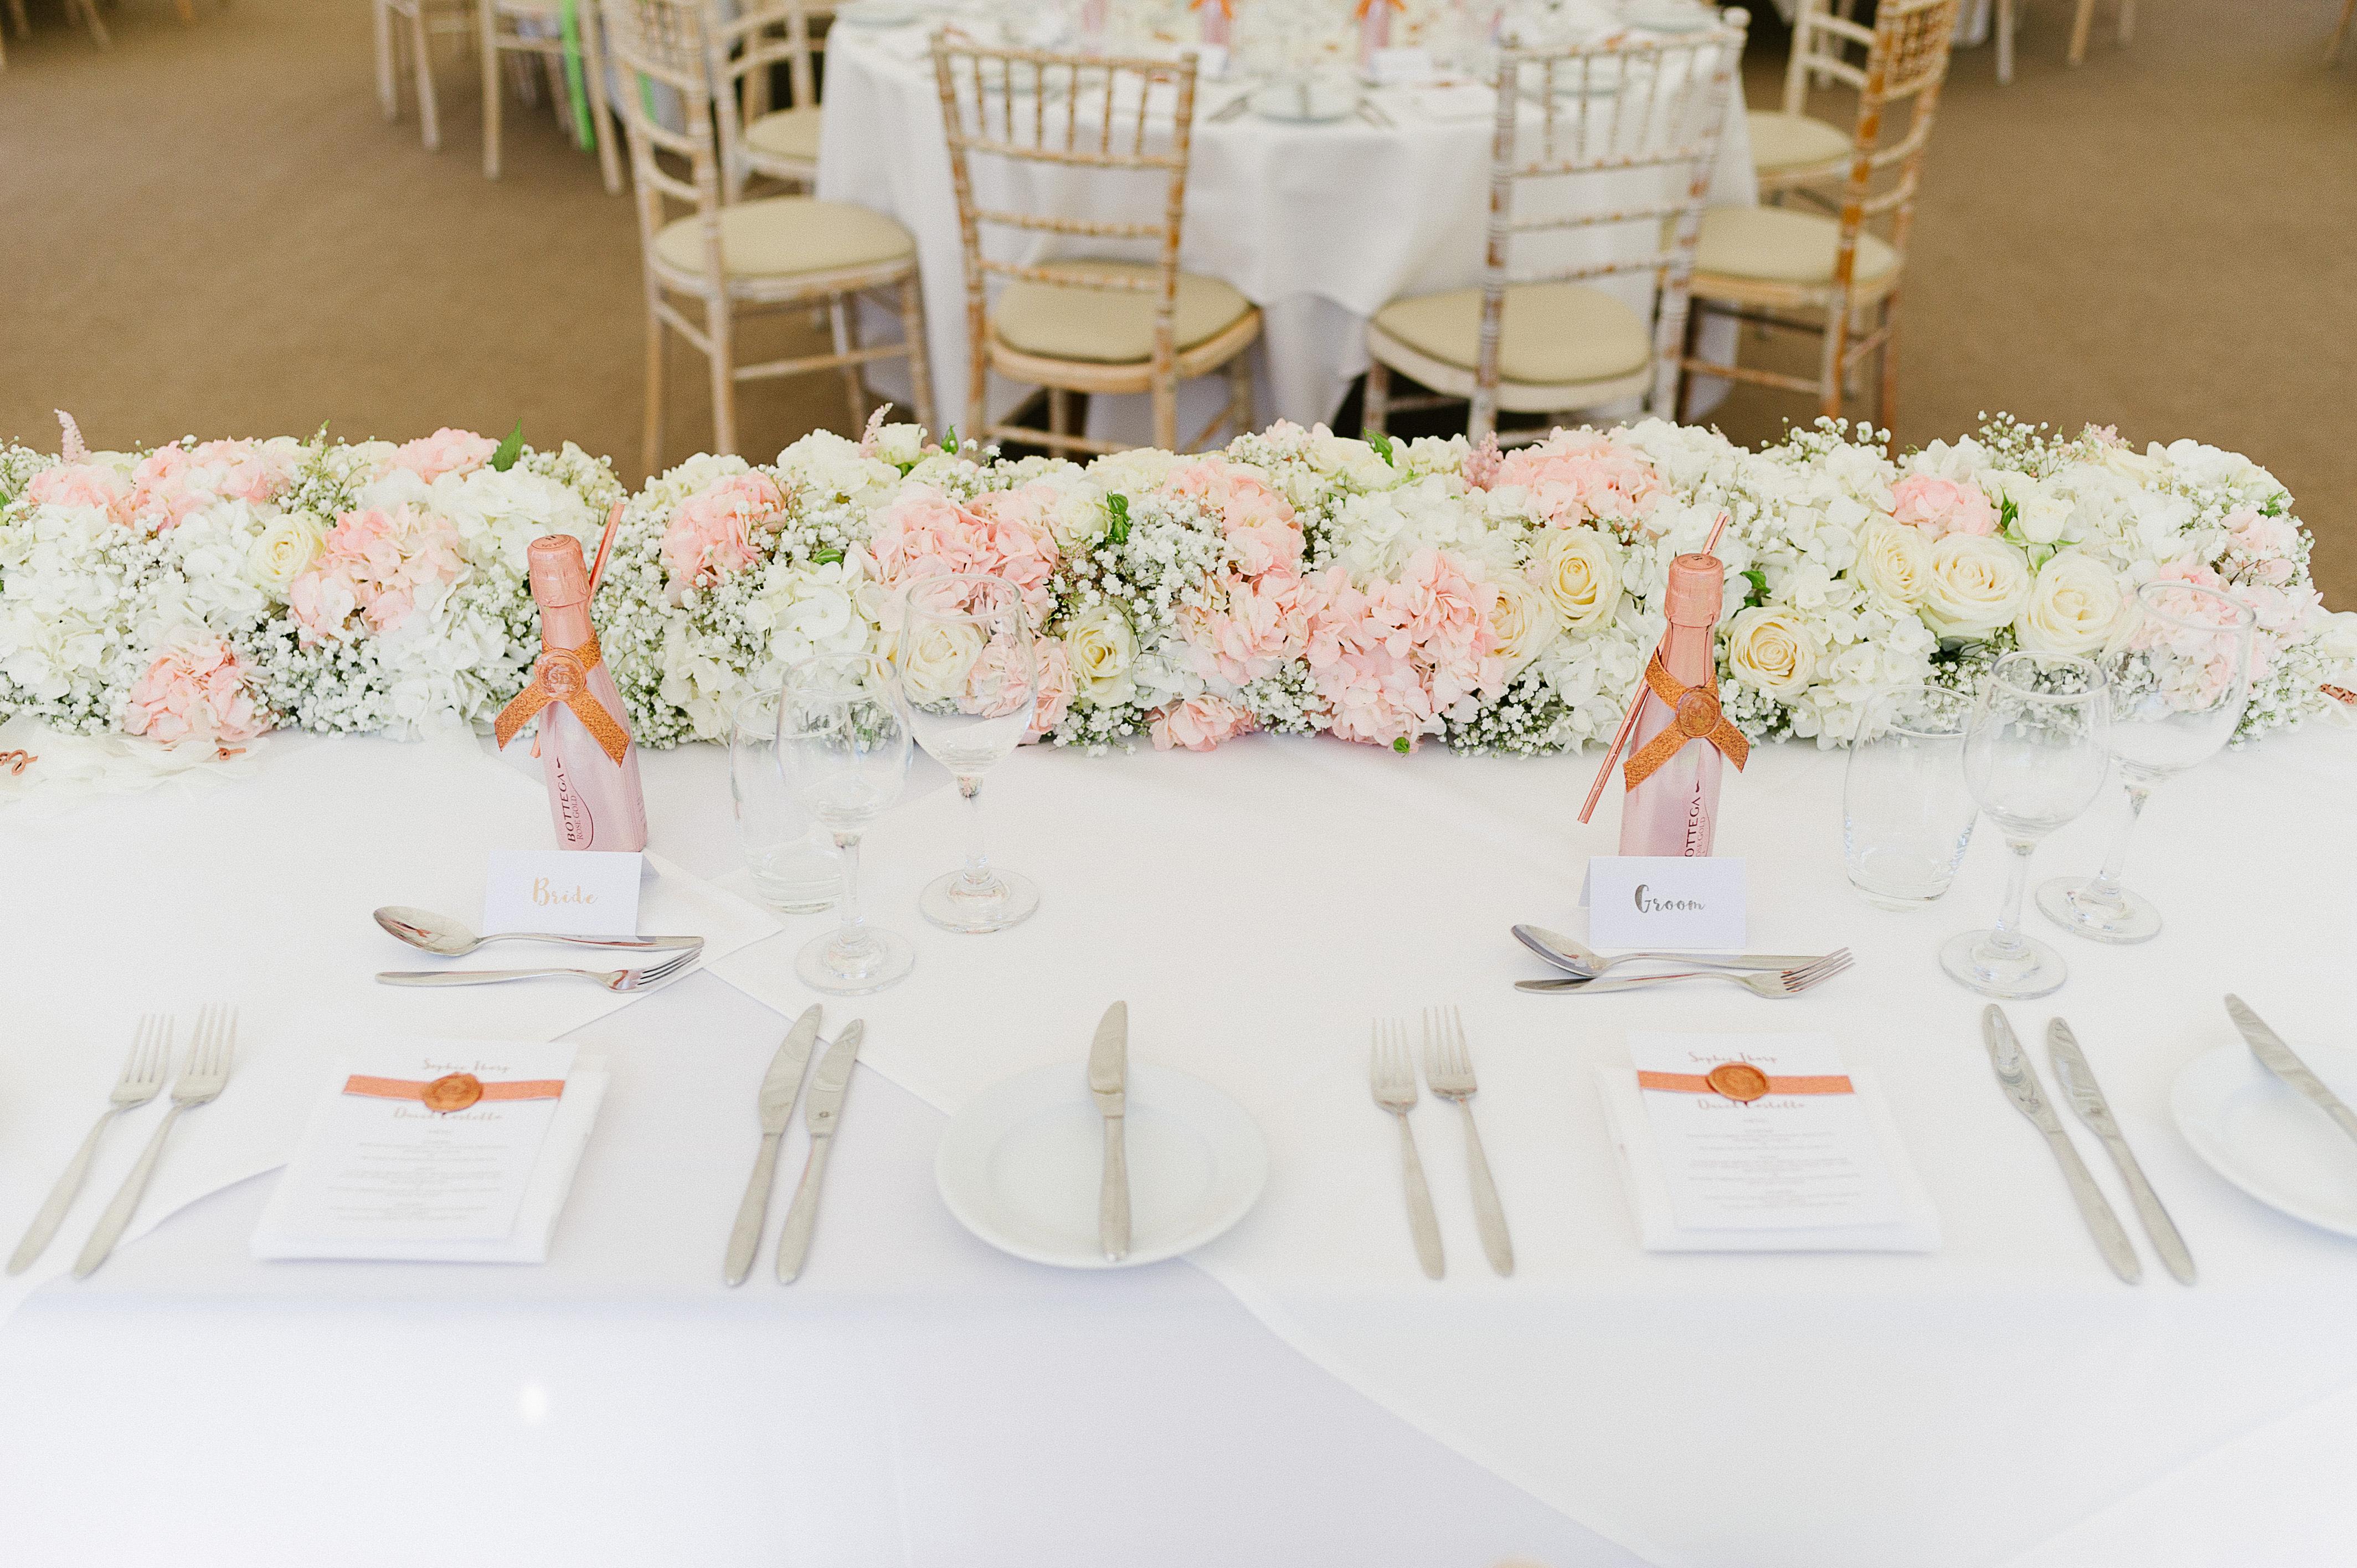 Ardington-house-wedding-ilaria-petrucci-photography-sophie-and-david-644